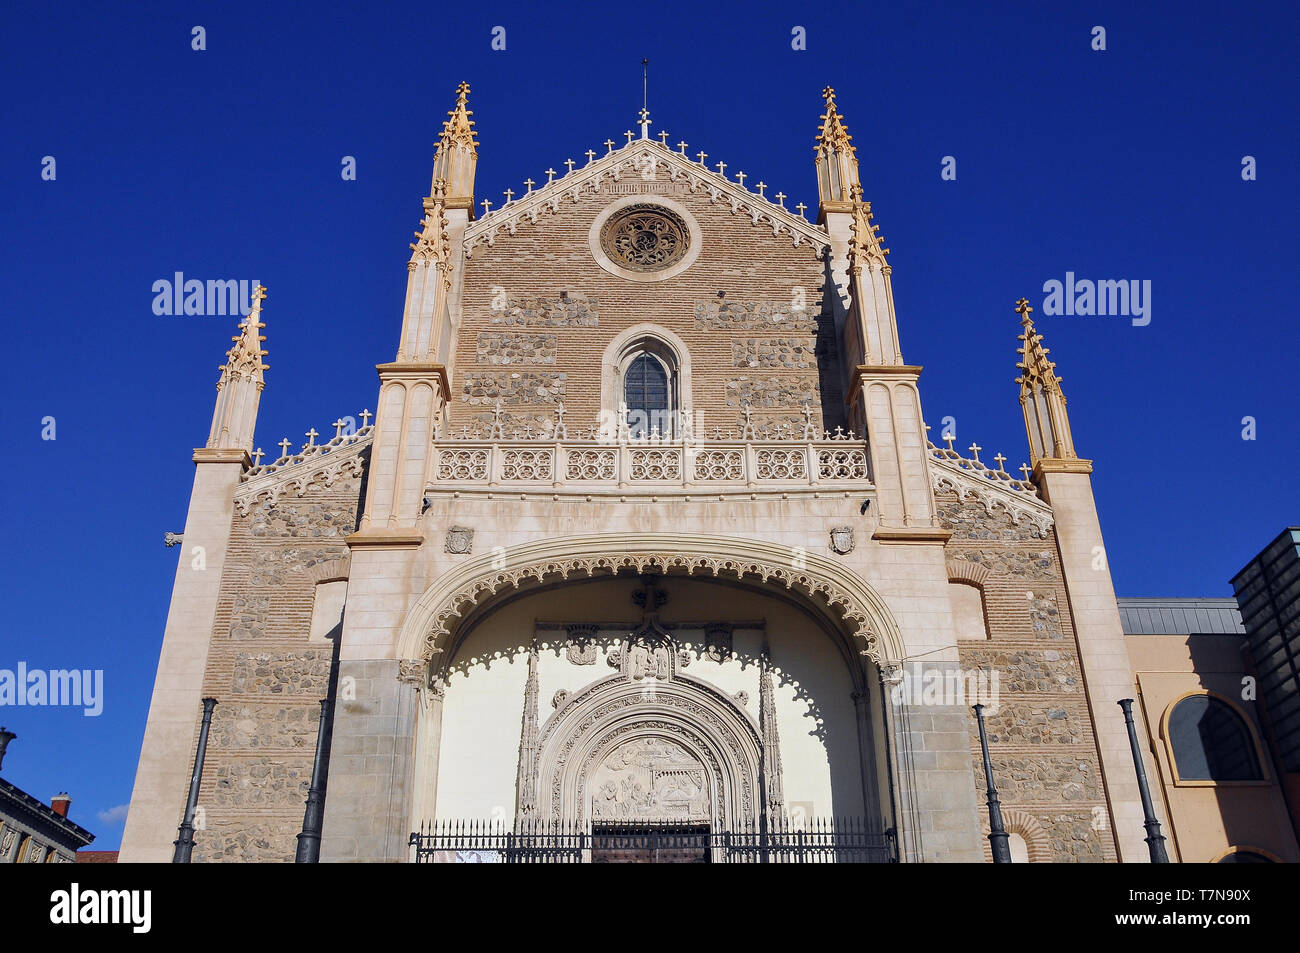 Iglesia de san Jerónimo el Real, Madrid, Spain - Stock Image